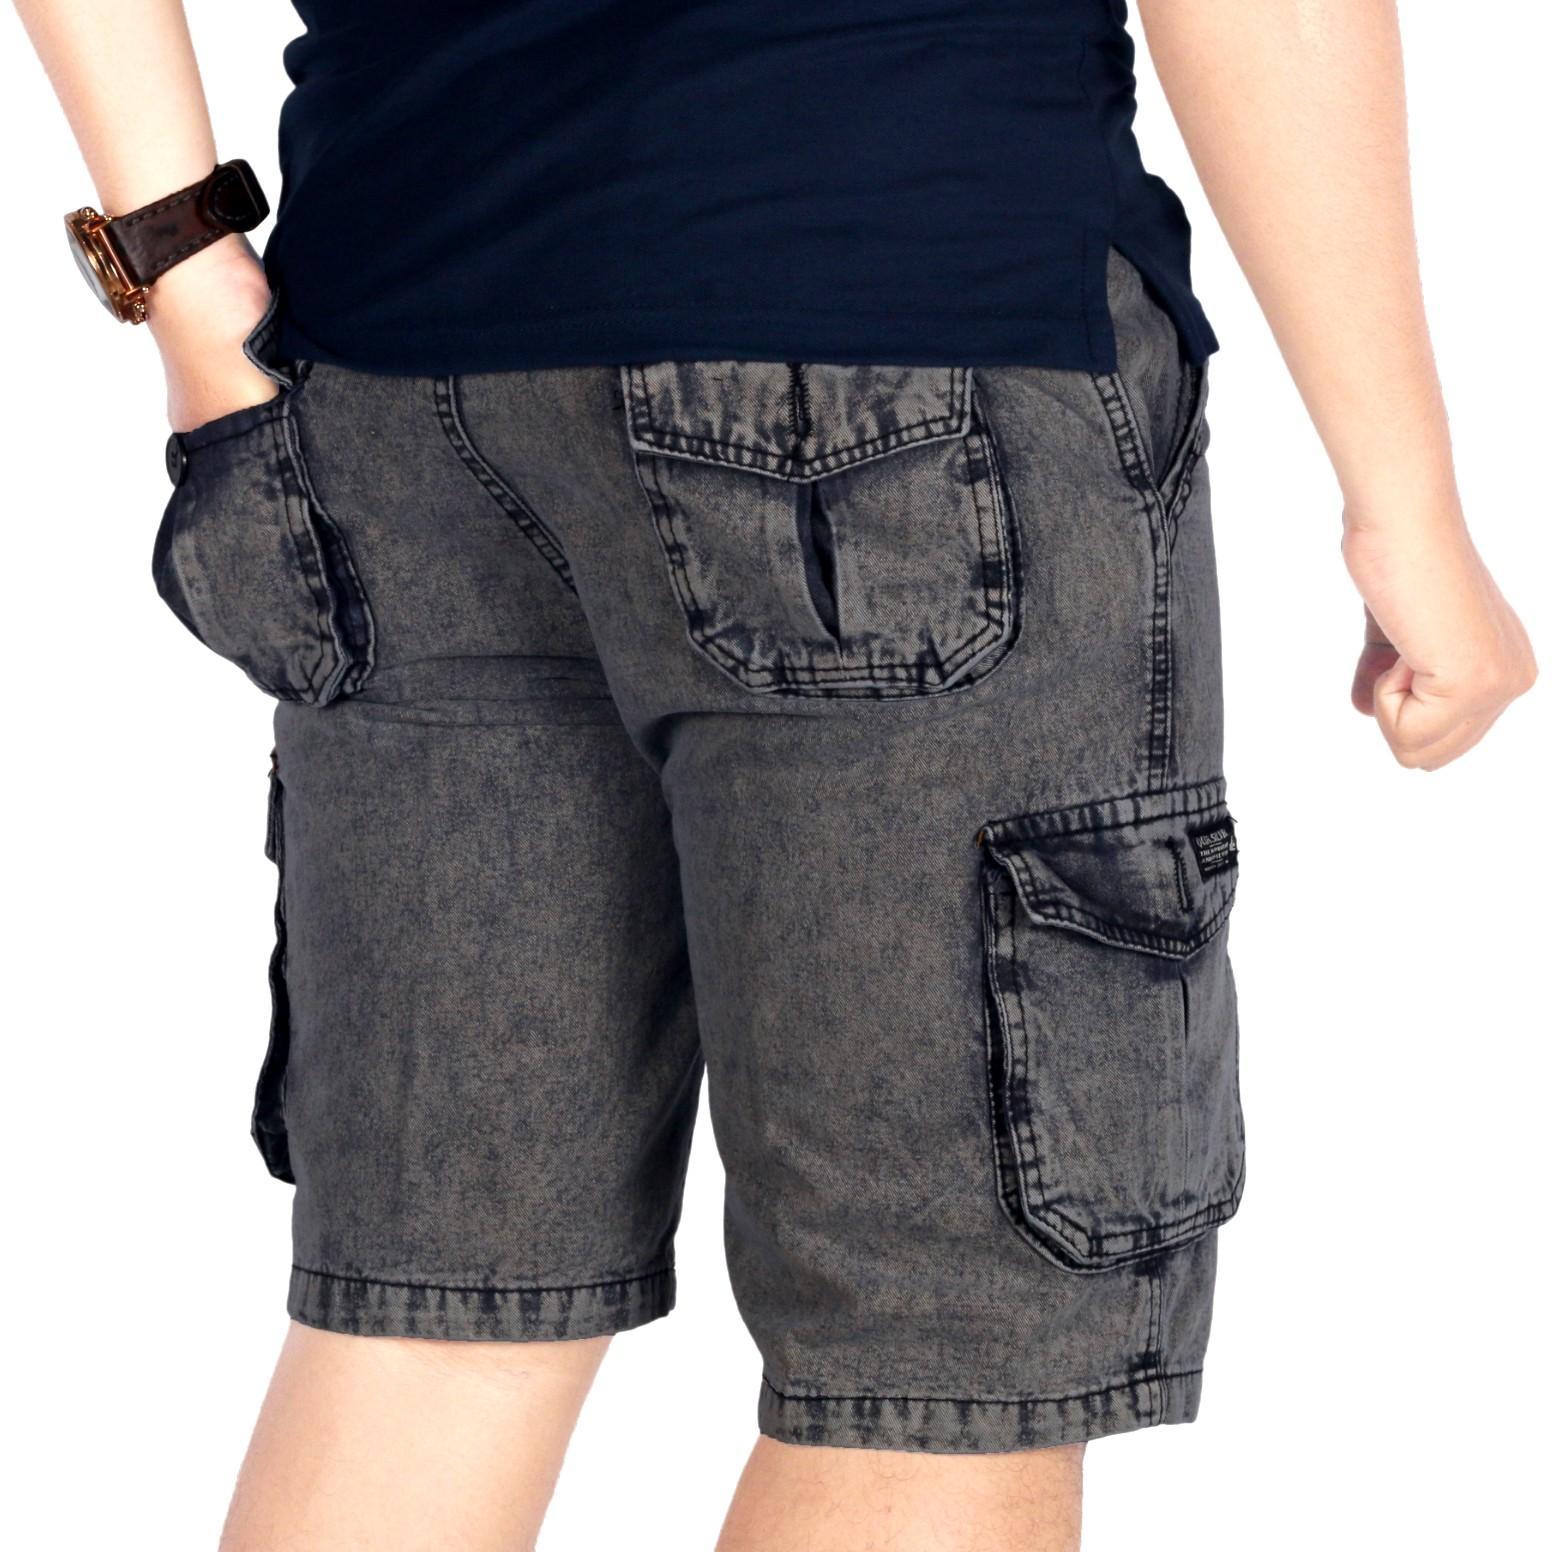 BSG Fashion1 Celana Pendek Polos Navy Distro  Celana Skinny Celana Pants Celana  Santai  922b0ffa28